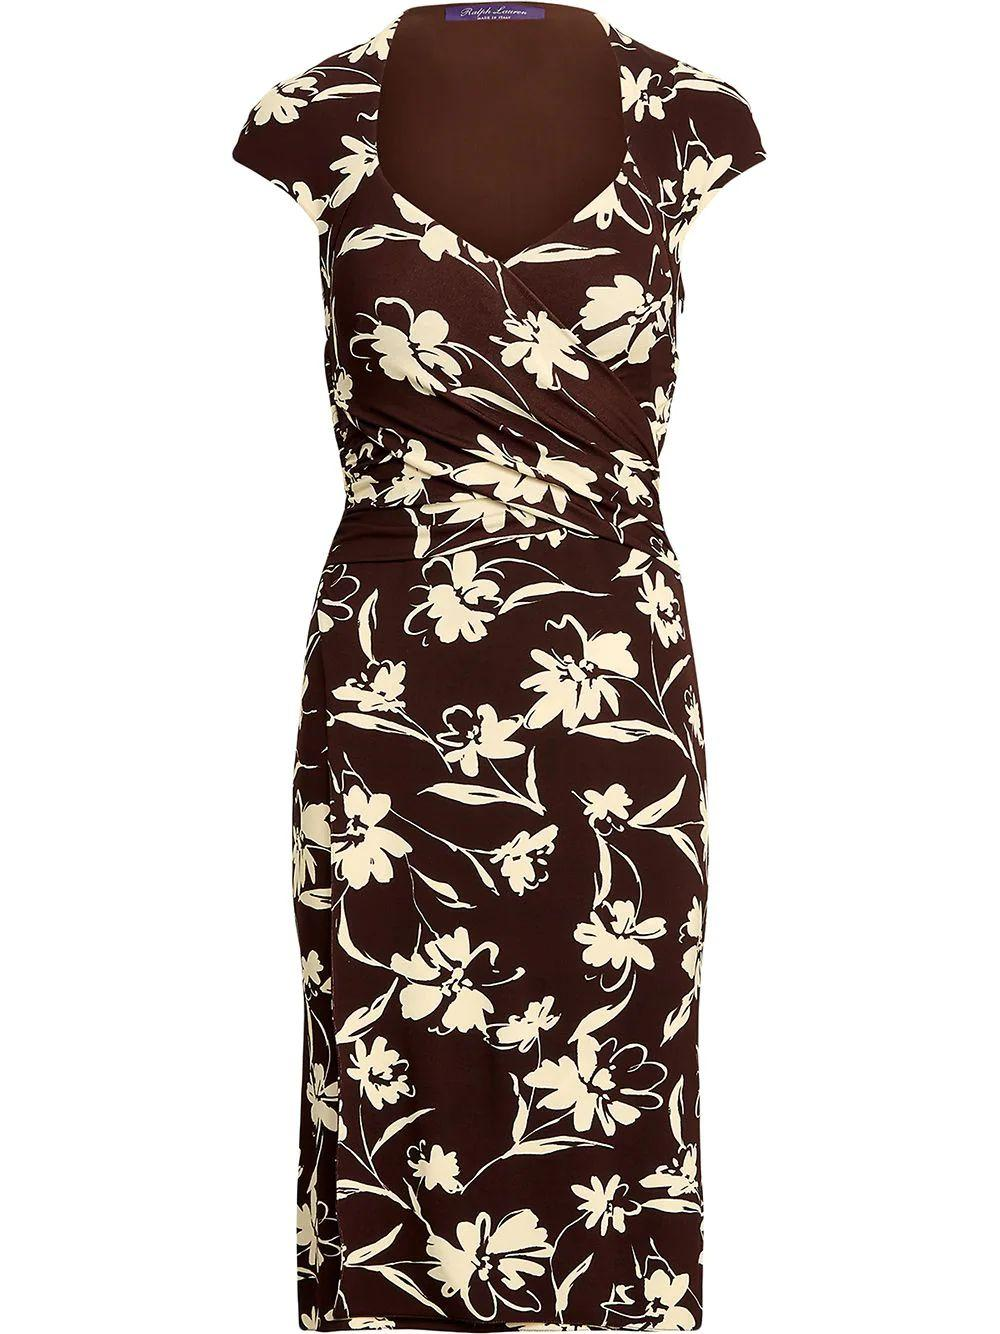 Jaela Floral Day Dress Item # 290840869001